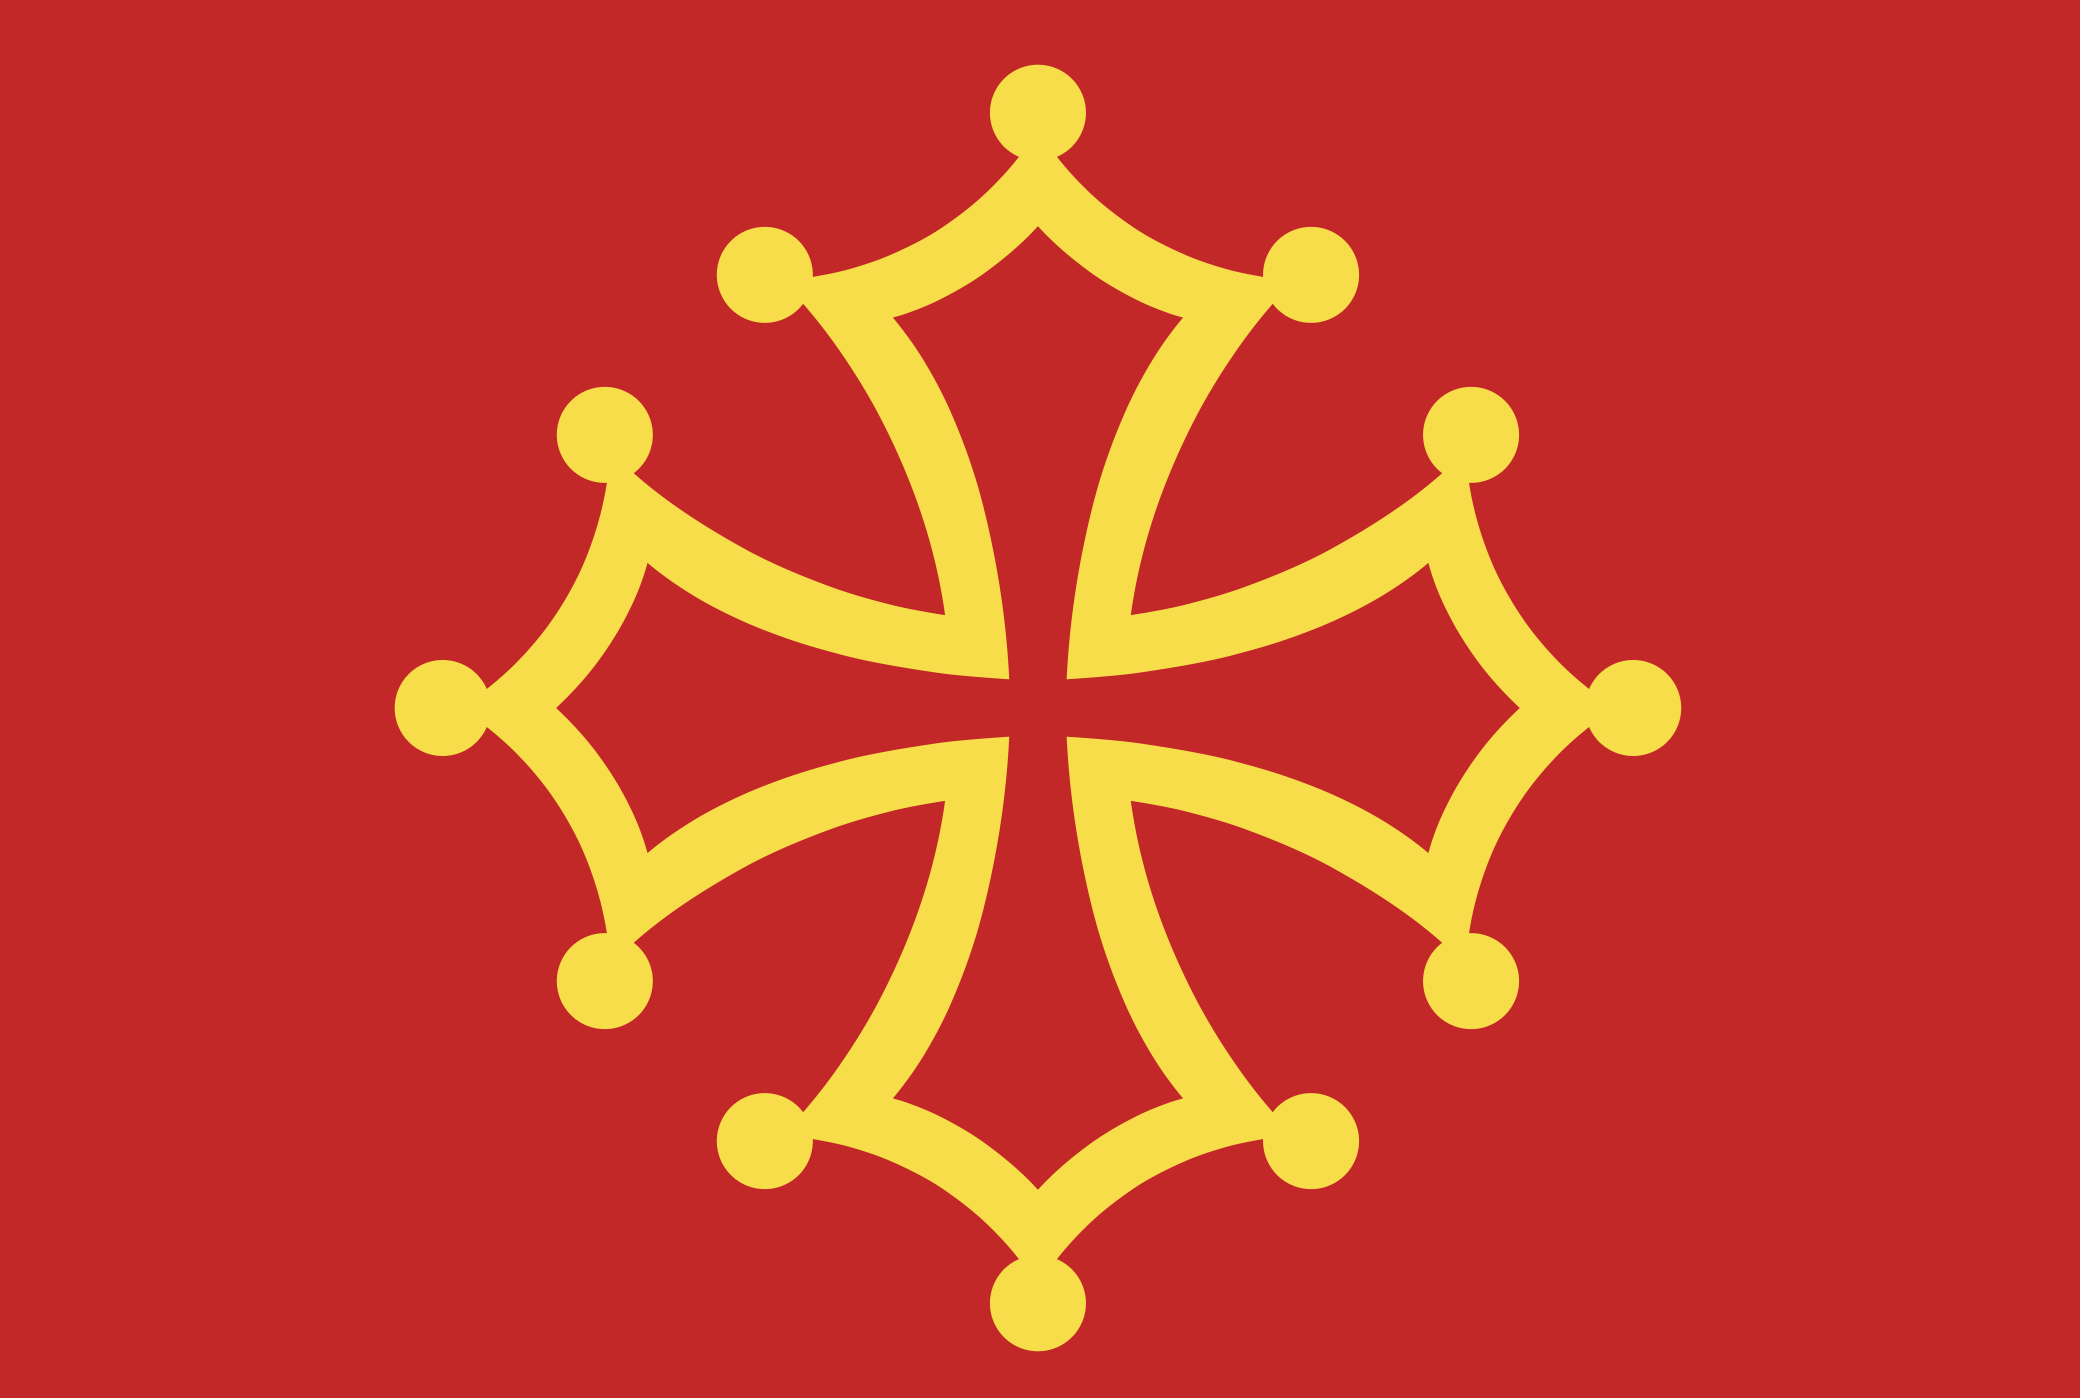 langue et culture occitanes - UPVD